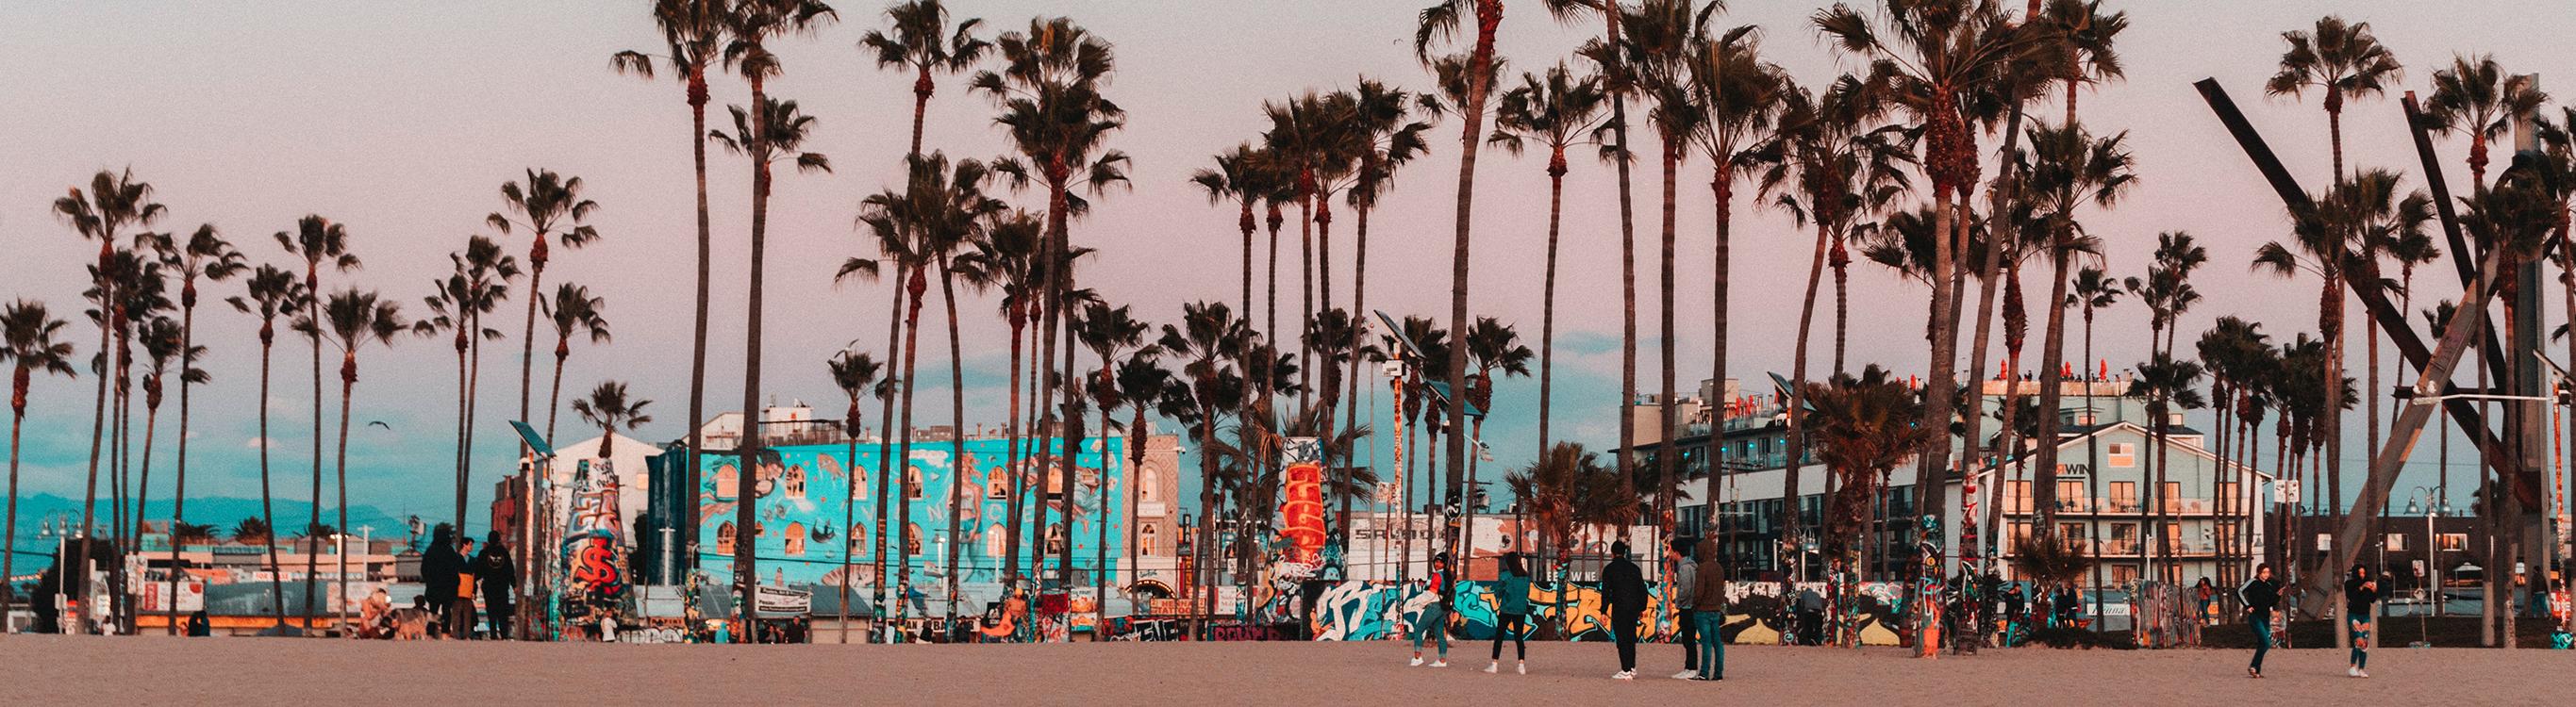 Peddal Bar Santa Monica - Best Bachelorette Party Pedal Pub Crawl in Santa Monica, California